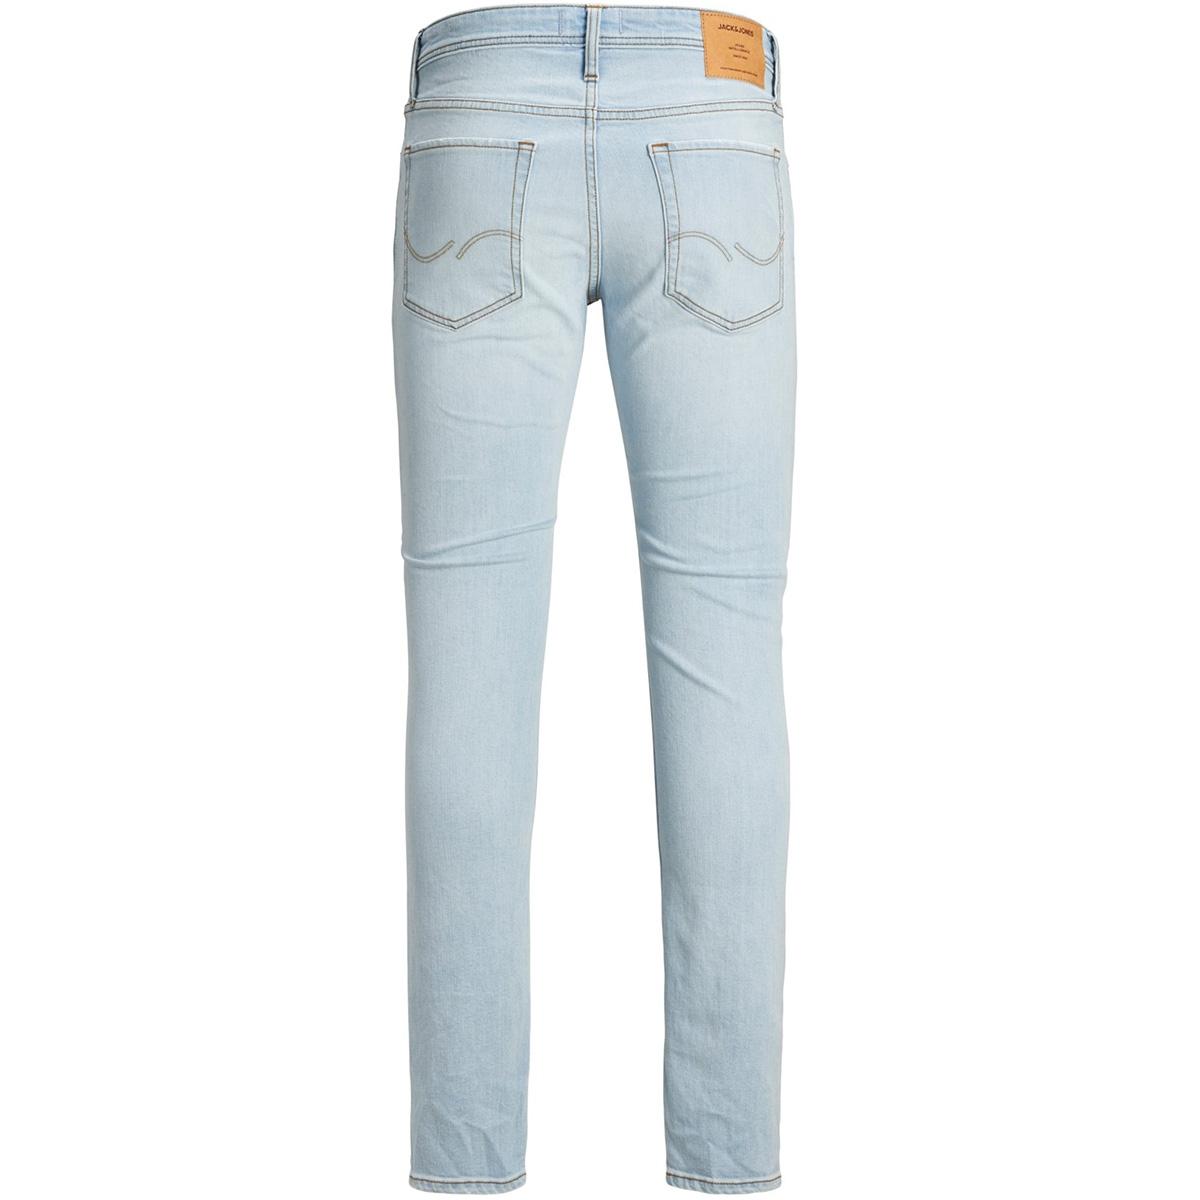 jjiglenn jjoriginal am 916 sts 12161083 jack & jones jeans bleu denim